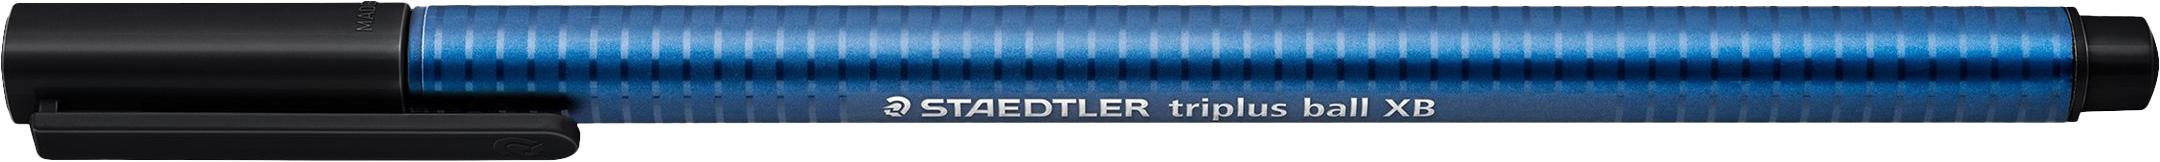 STAEDTLER triplus ball 437 - Stylo à bille - noir